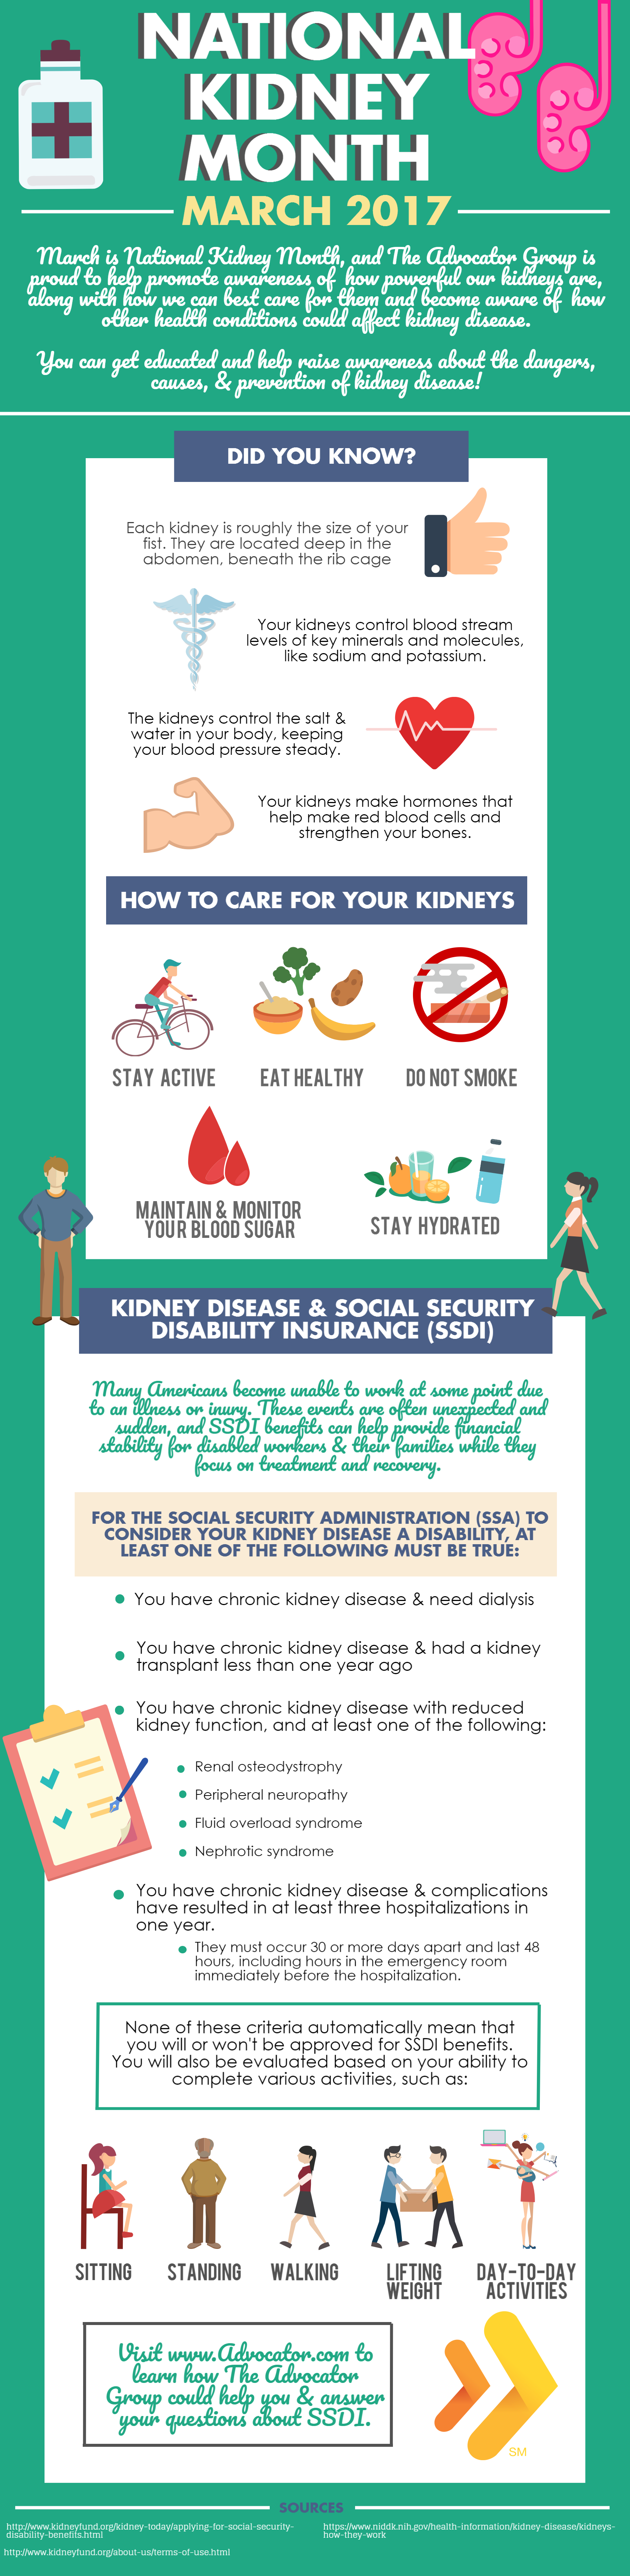 Natl kidney month infographic